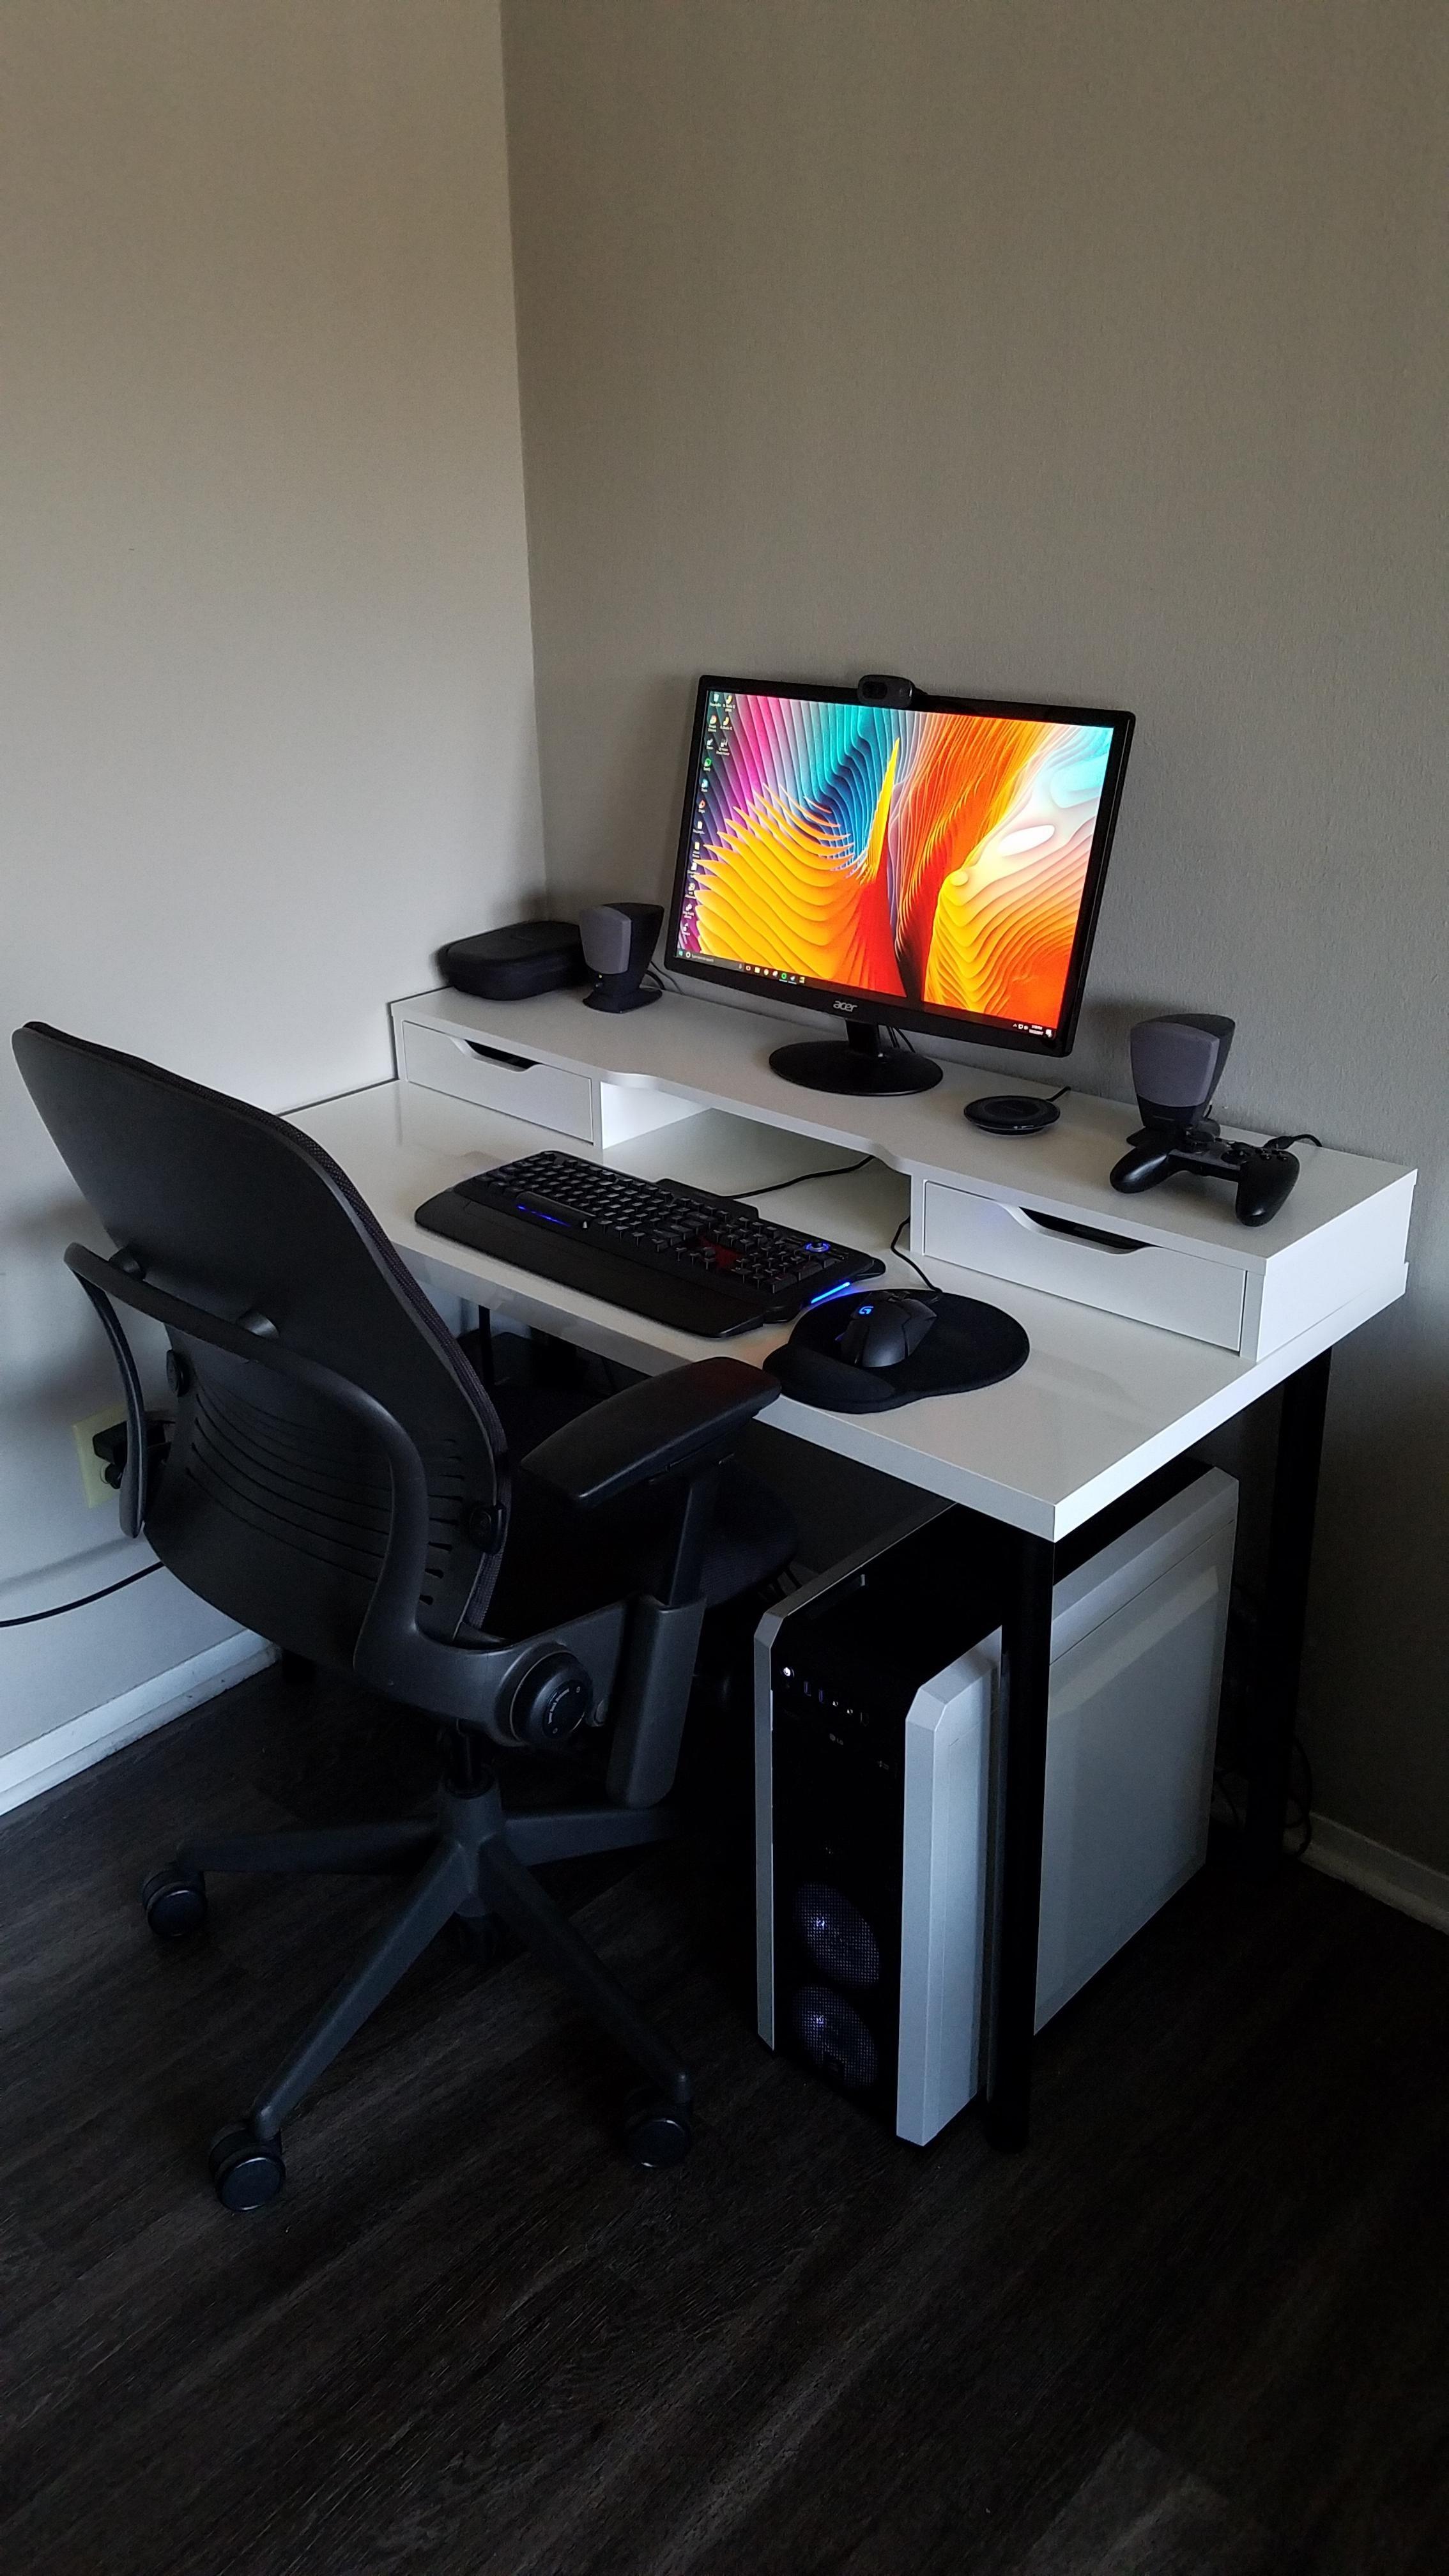 My black and white corner setup really accentuates